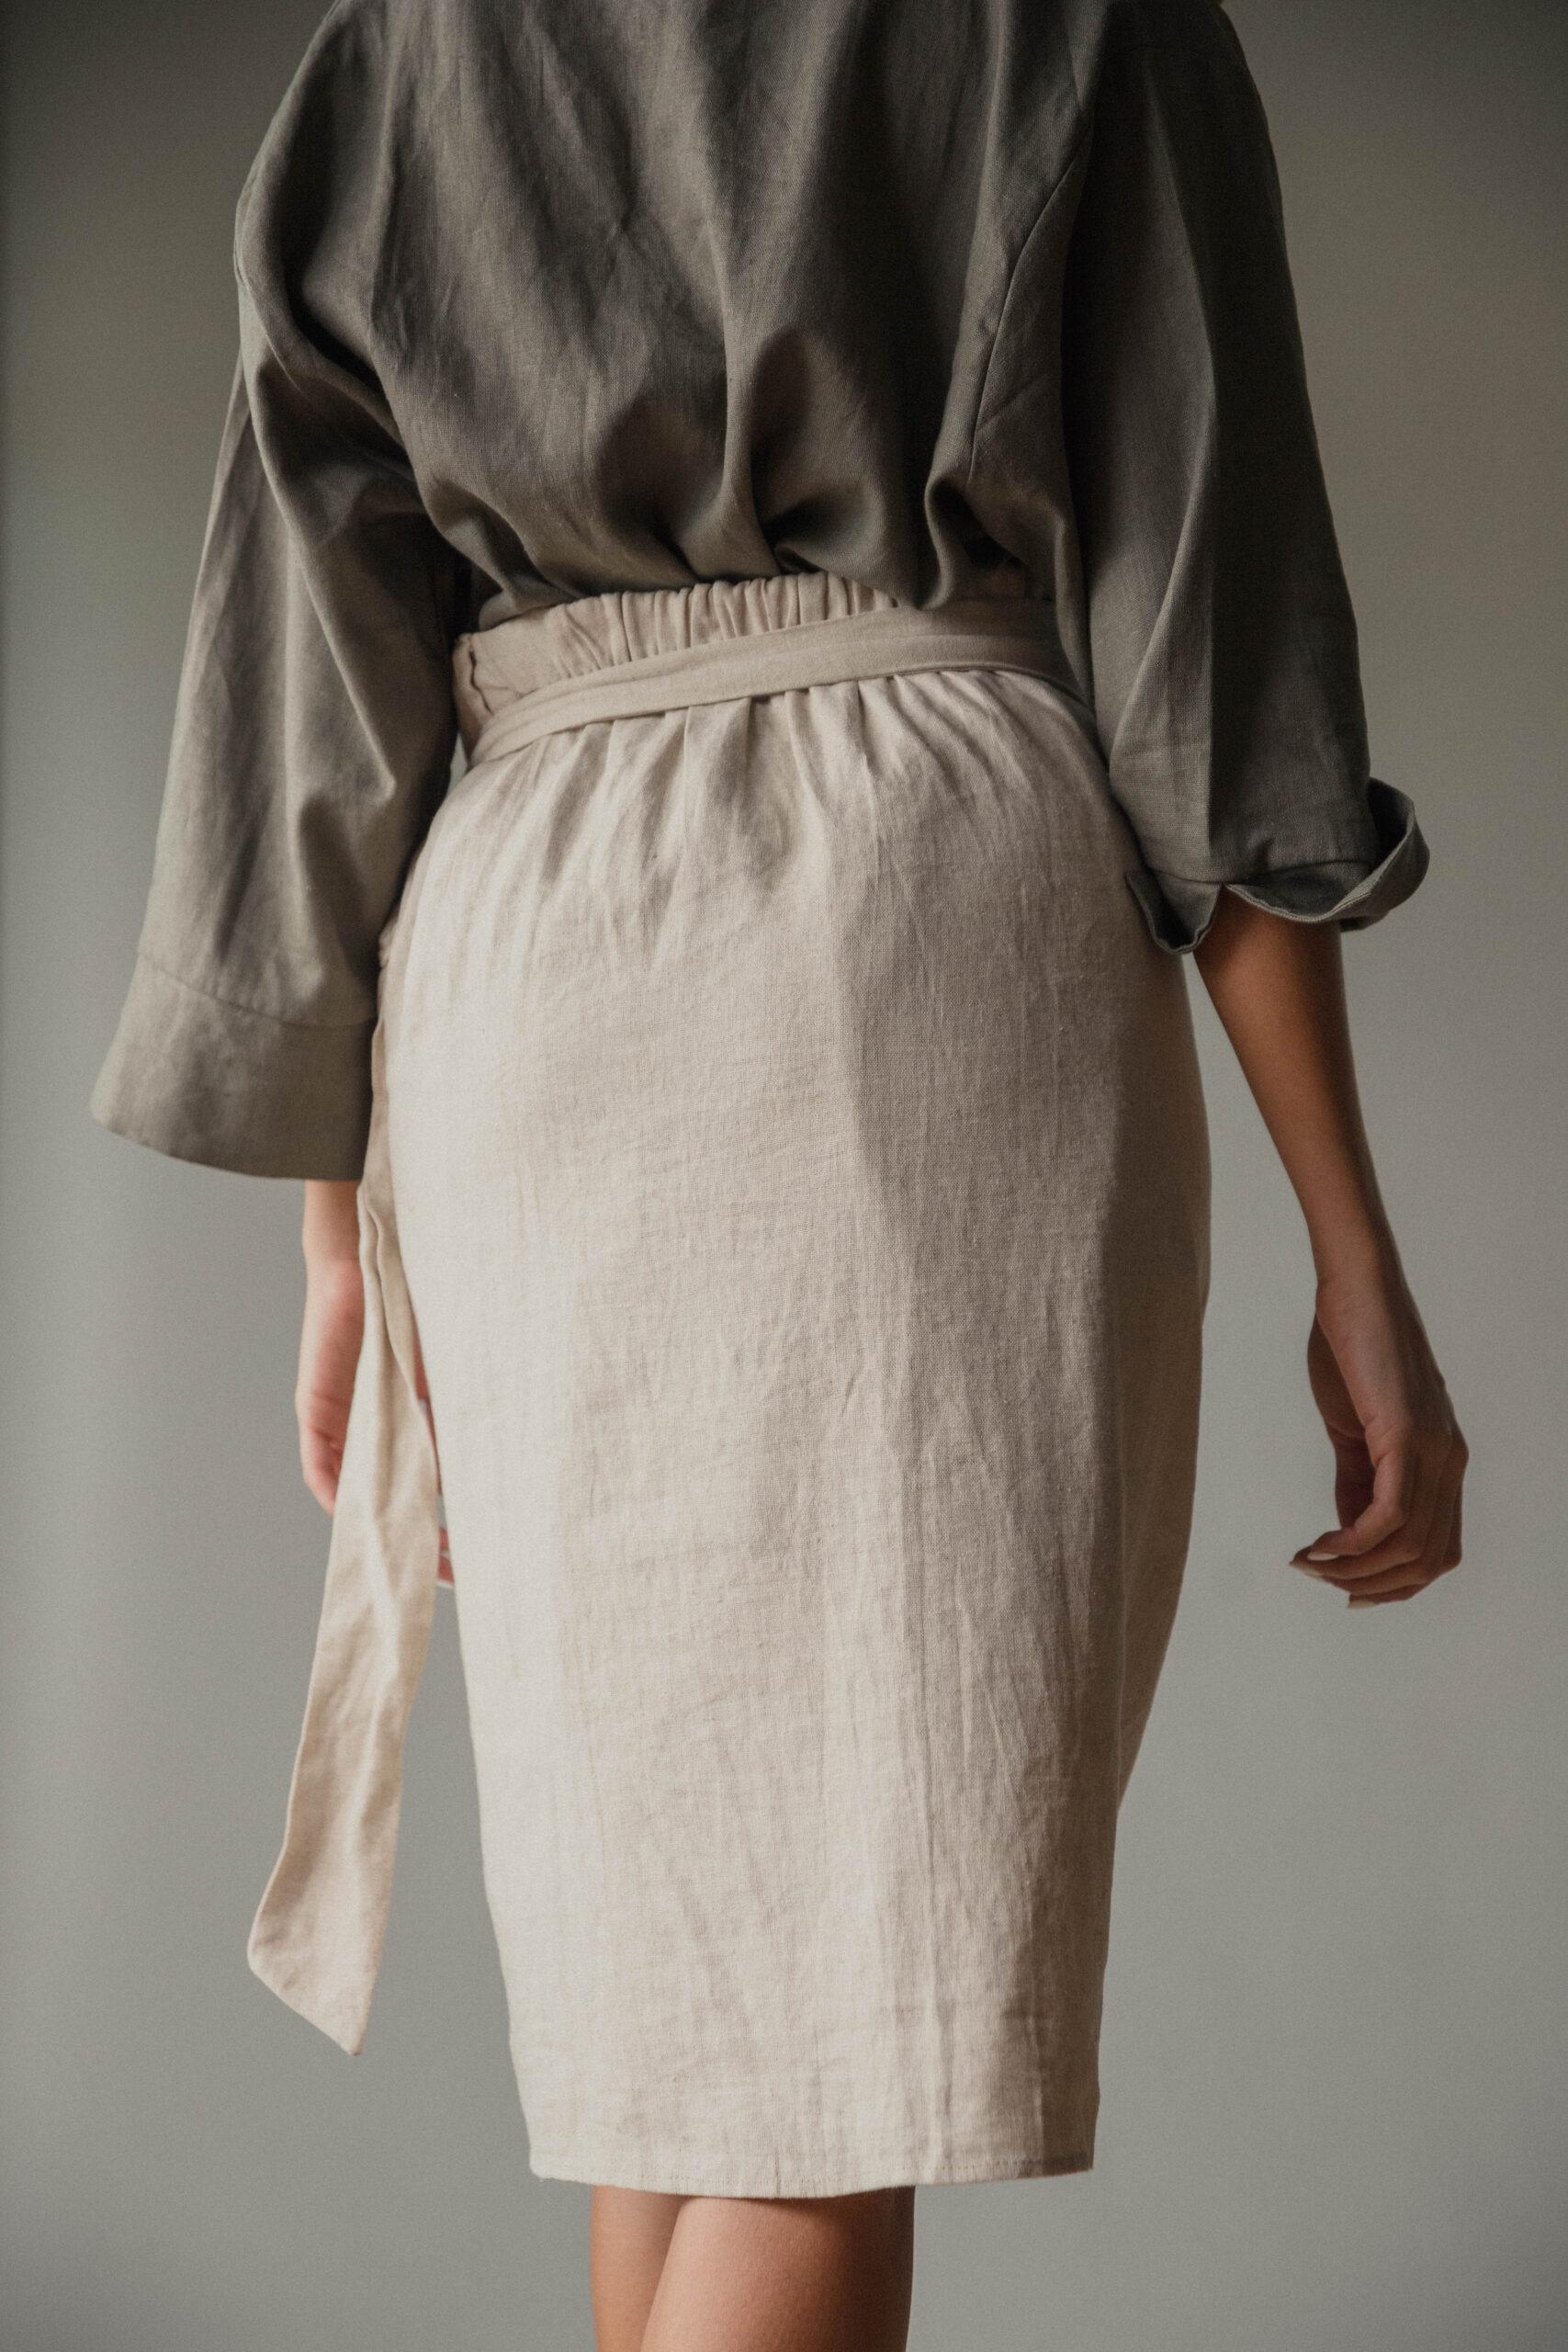 ropa-falda-lola-natural-claro-y-crudo-atizz (2)